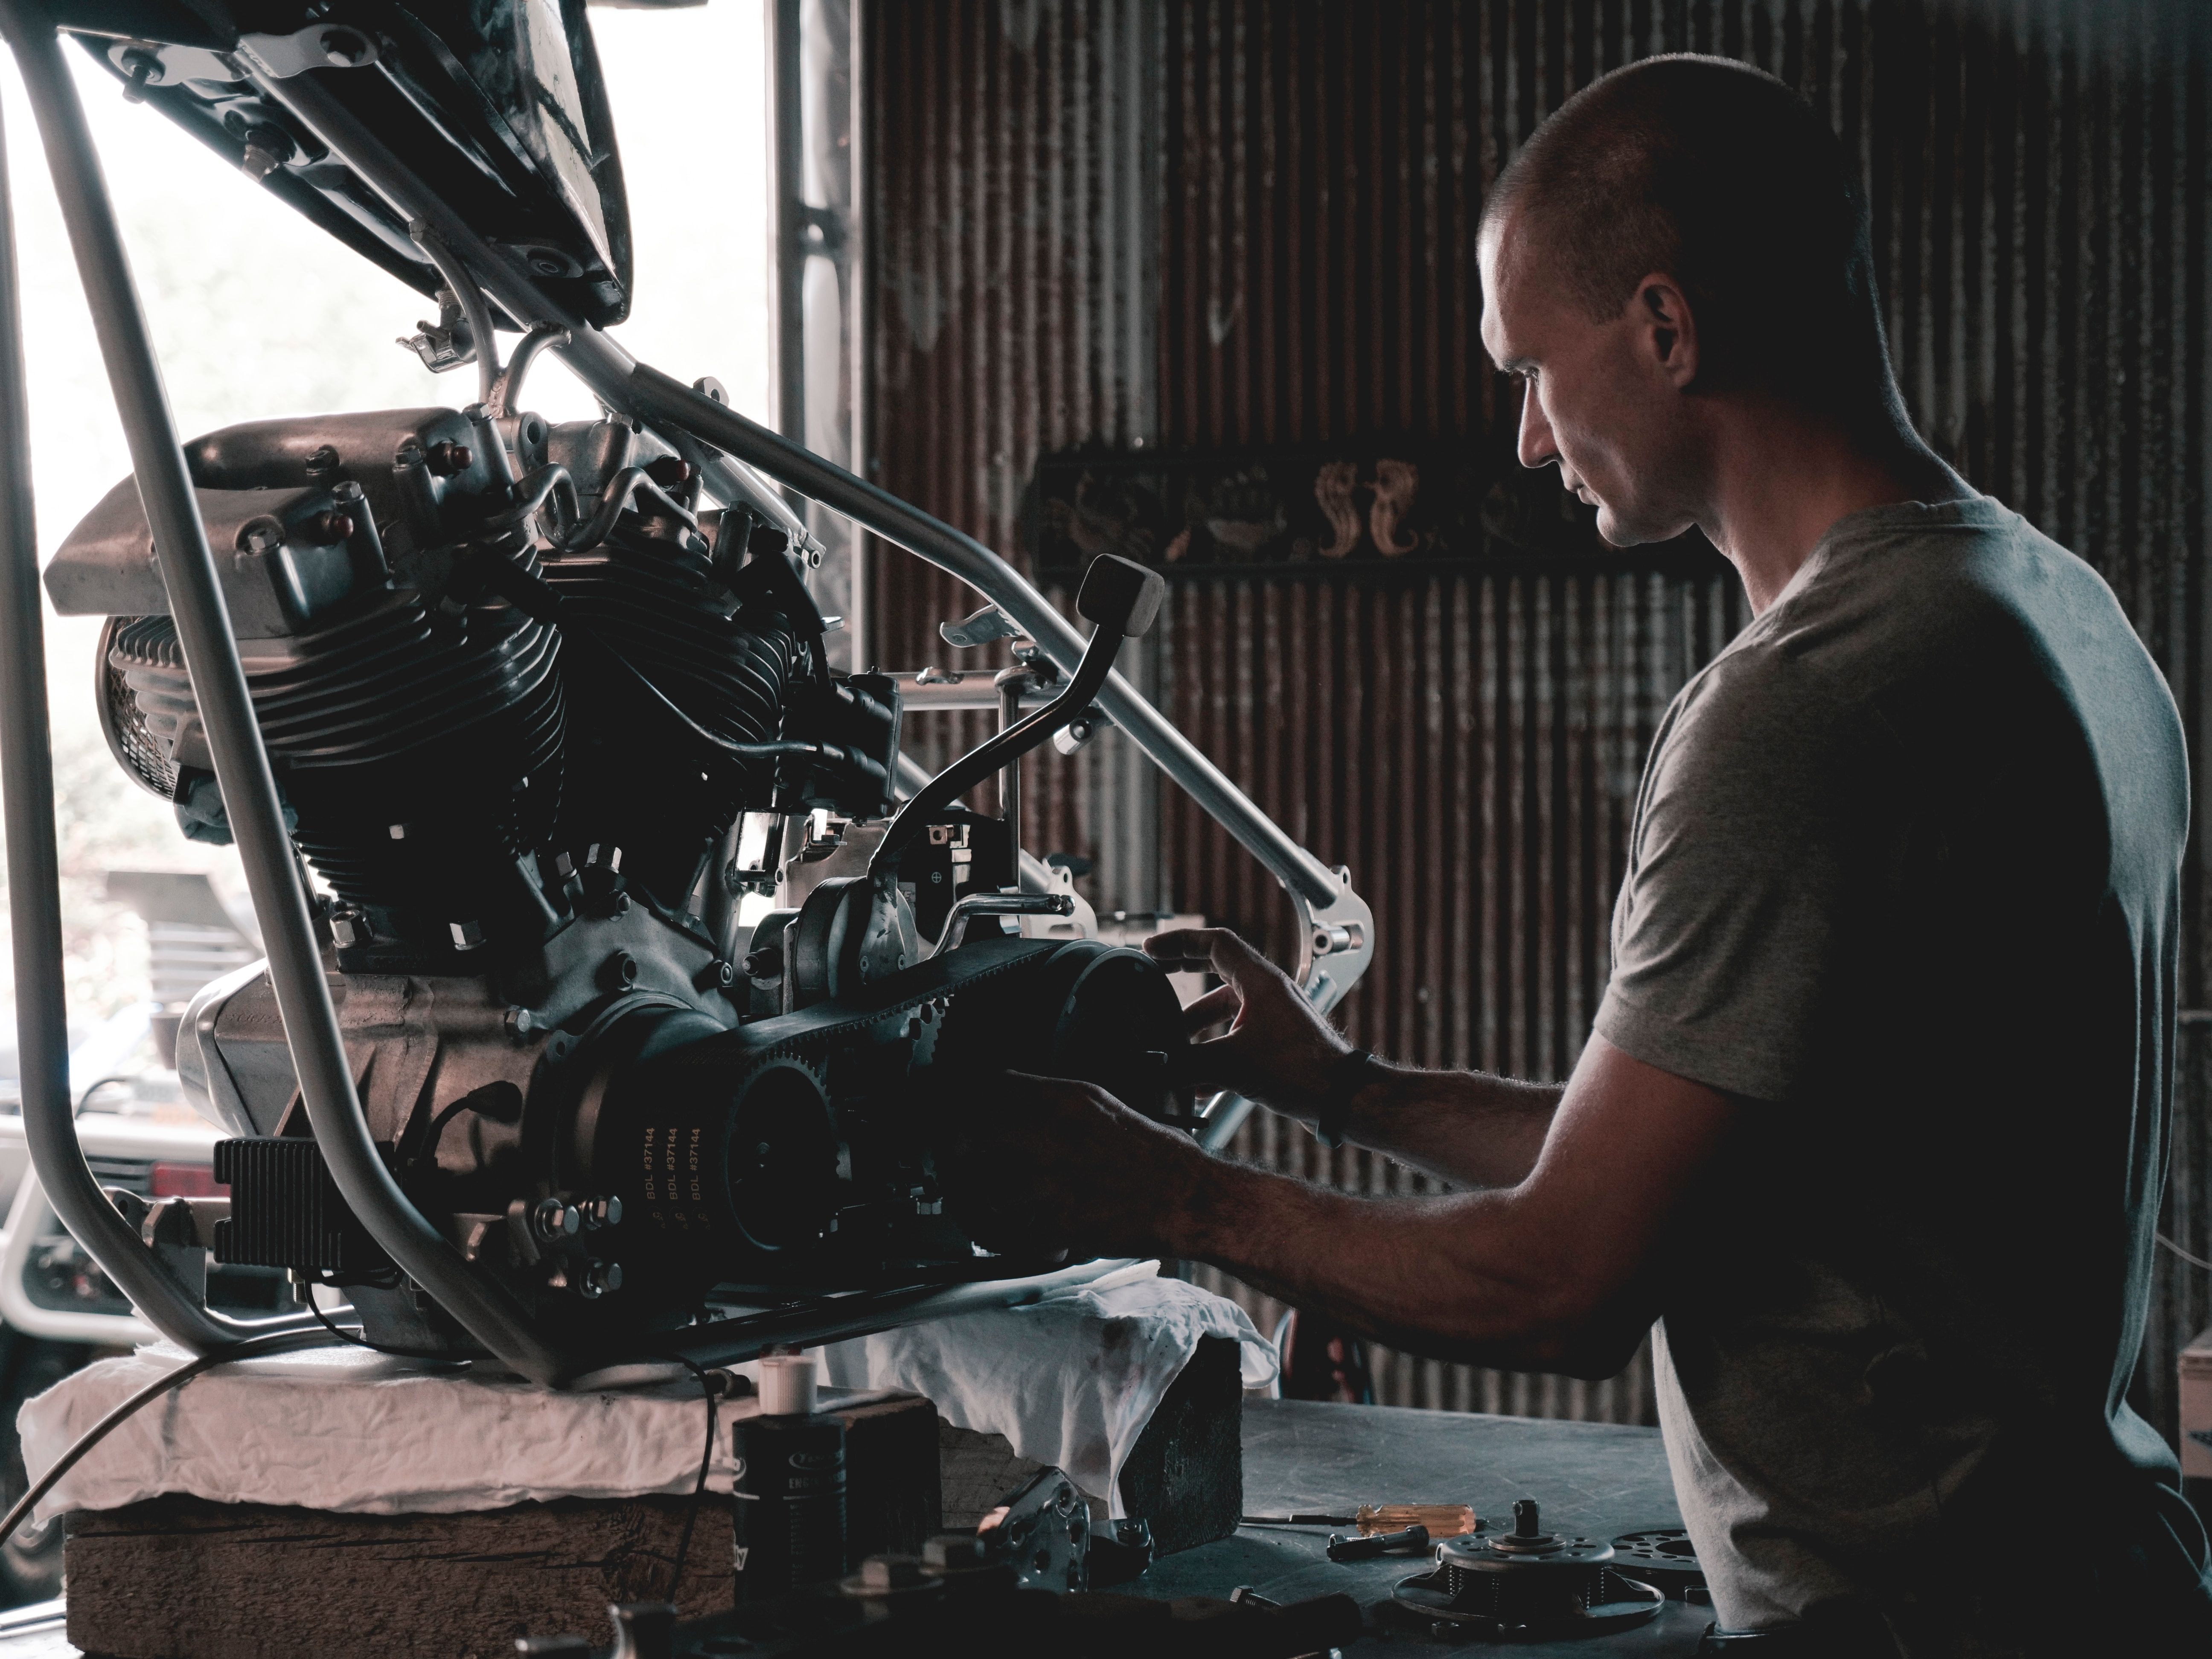 Bike Engine maintenance